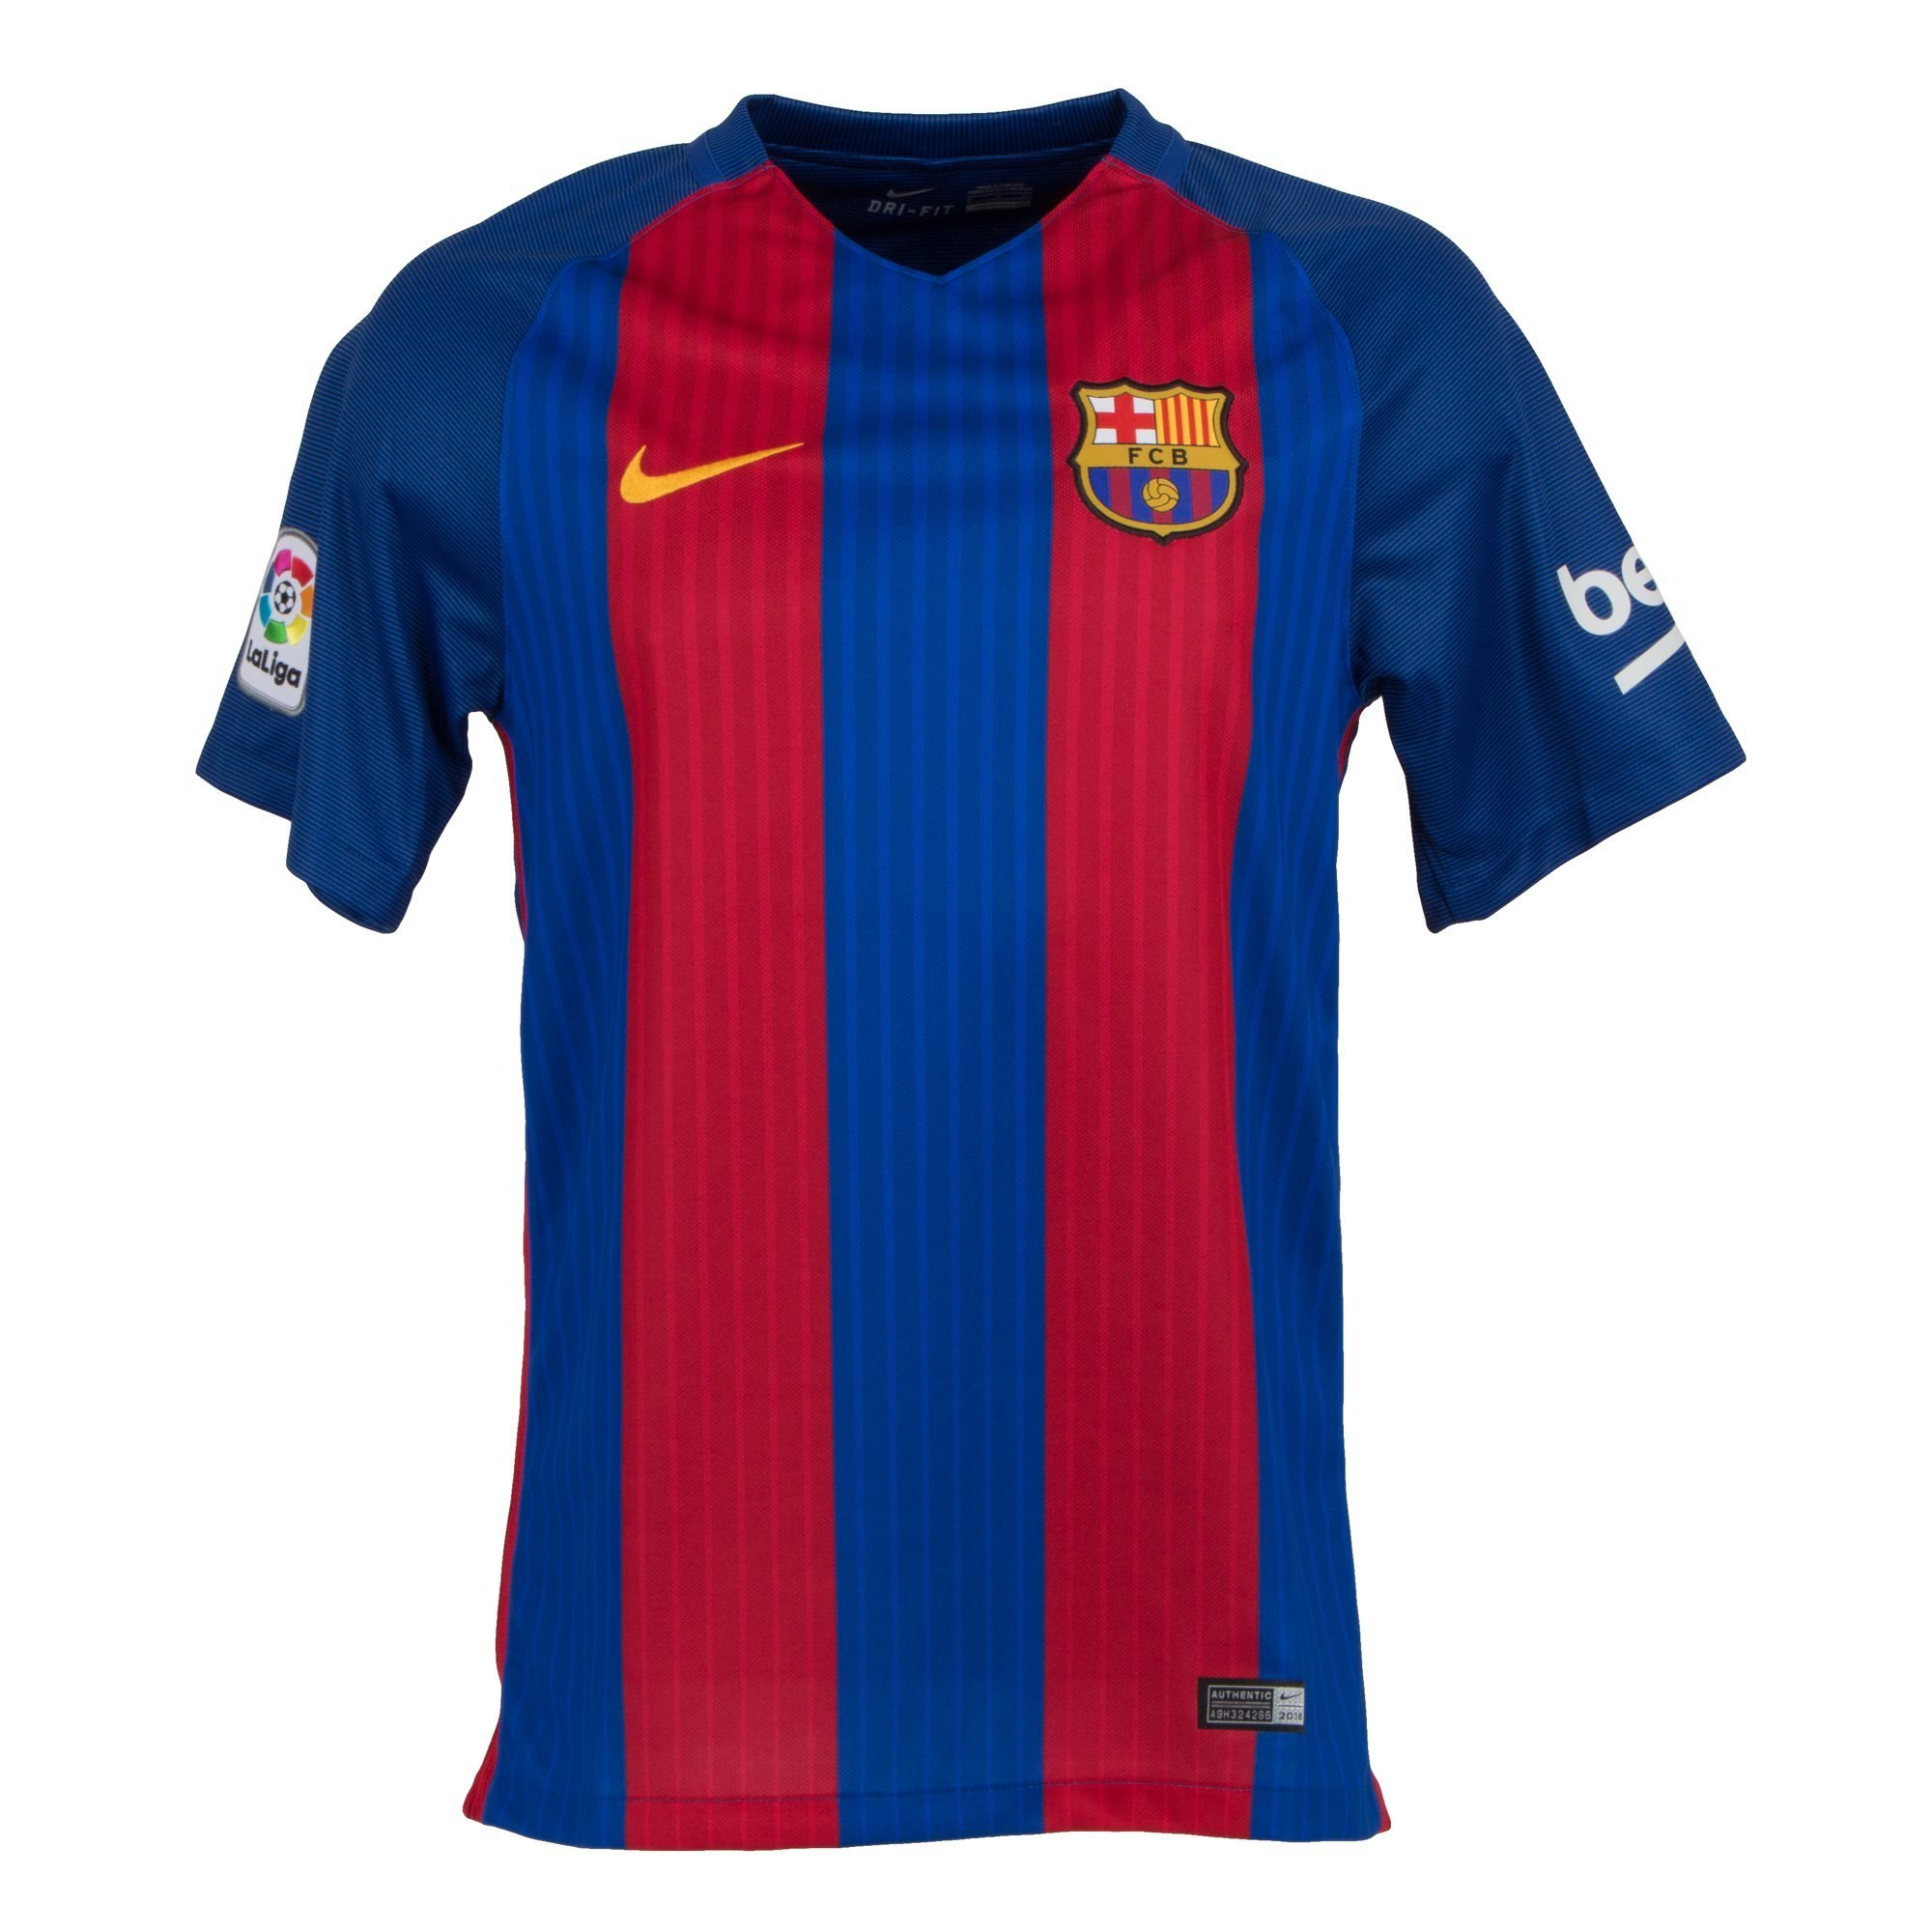 45e2b17117f3c NIKE - Camiseta FC Barcelona Primera Equipación 2016 2017. Loading zoom